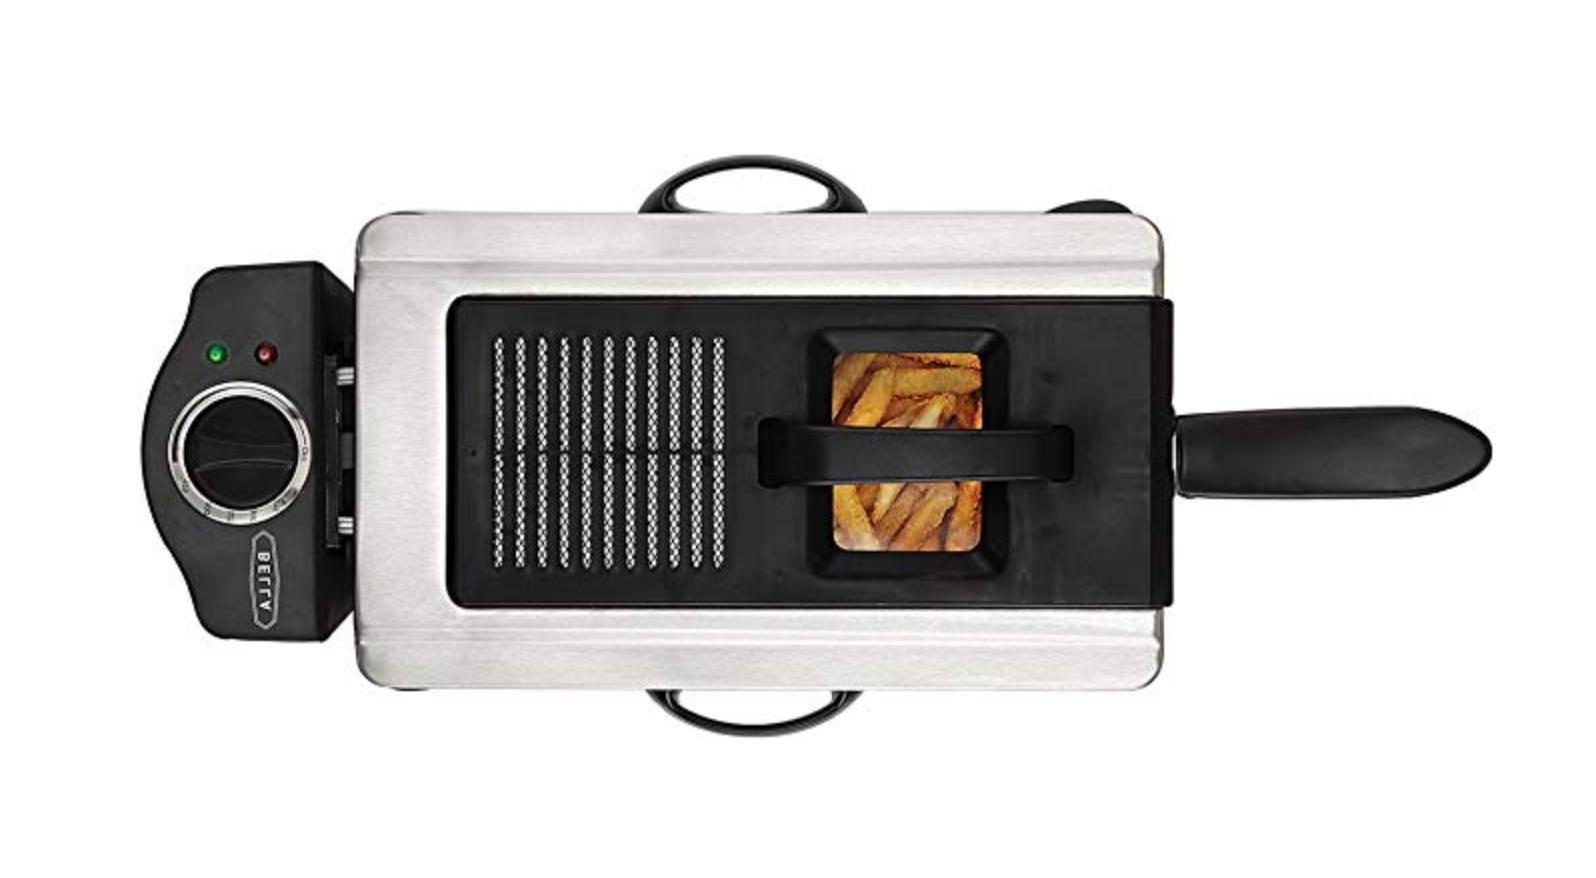 Bella 3.5L Deep Fryer, Stainless Steel